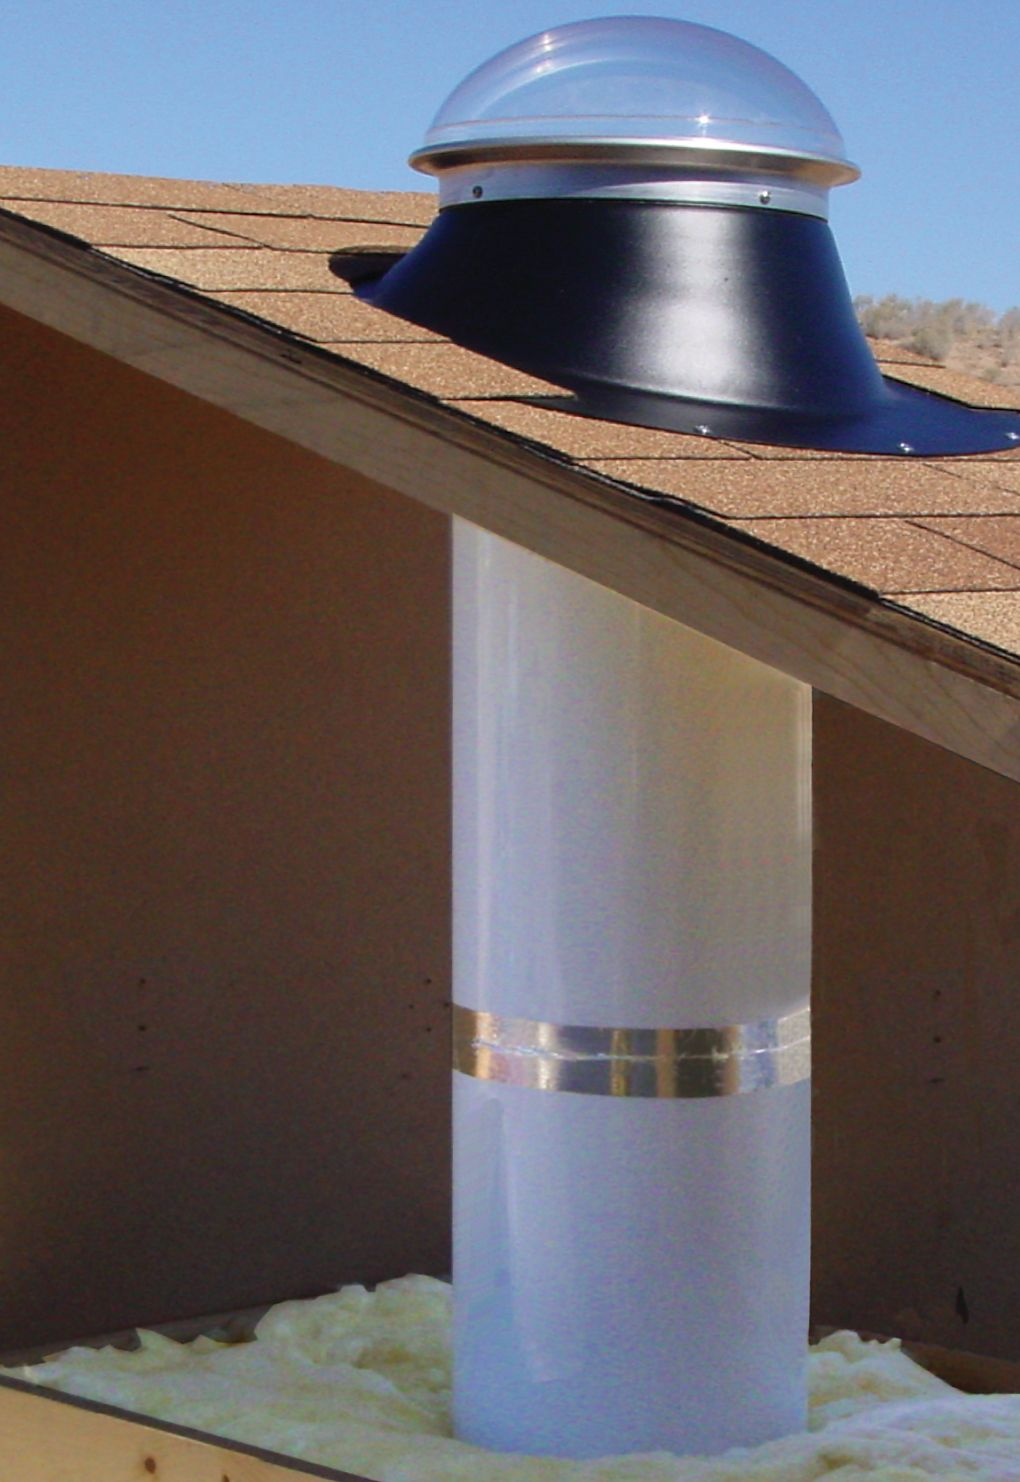 Tubular Skylights Arizona Energy Products And Seamless Rain Gutters Tubular Skylights Solar Panels Alternative Energy